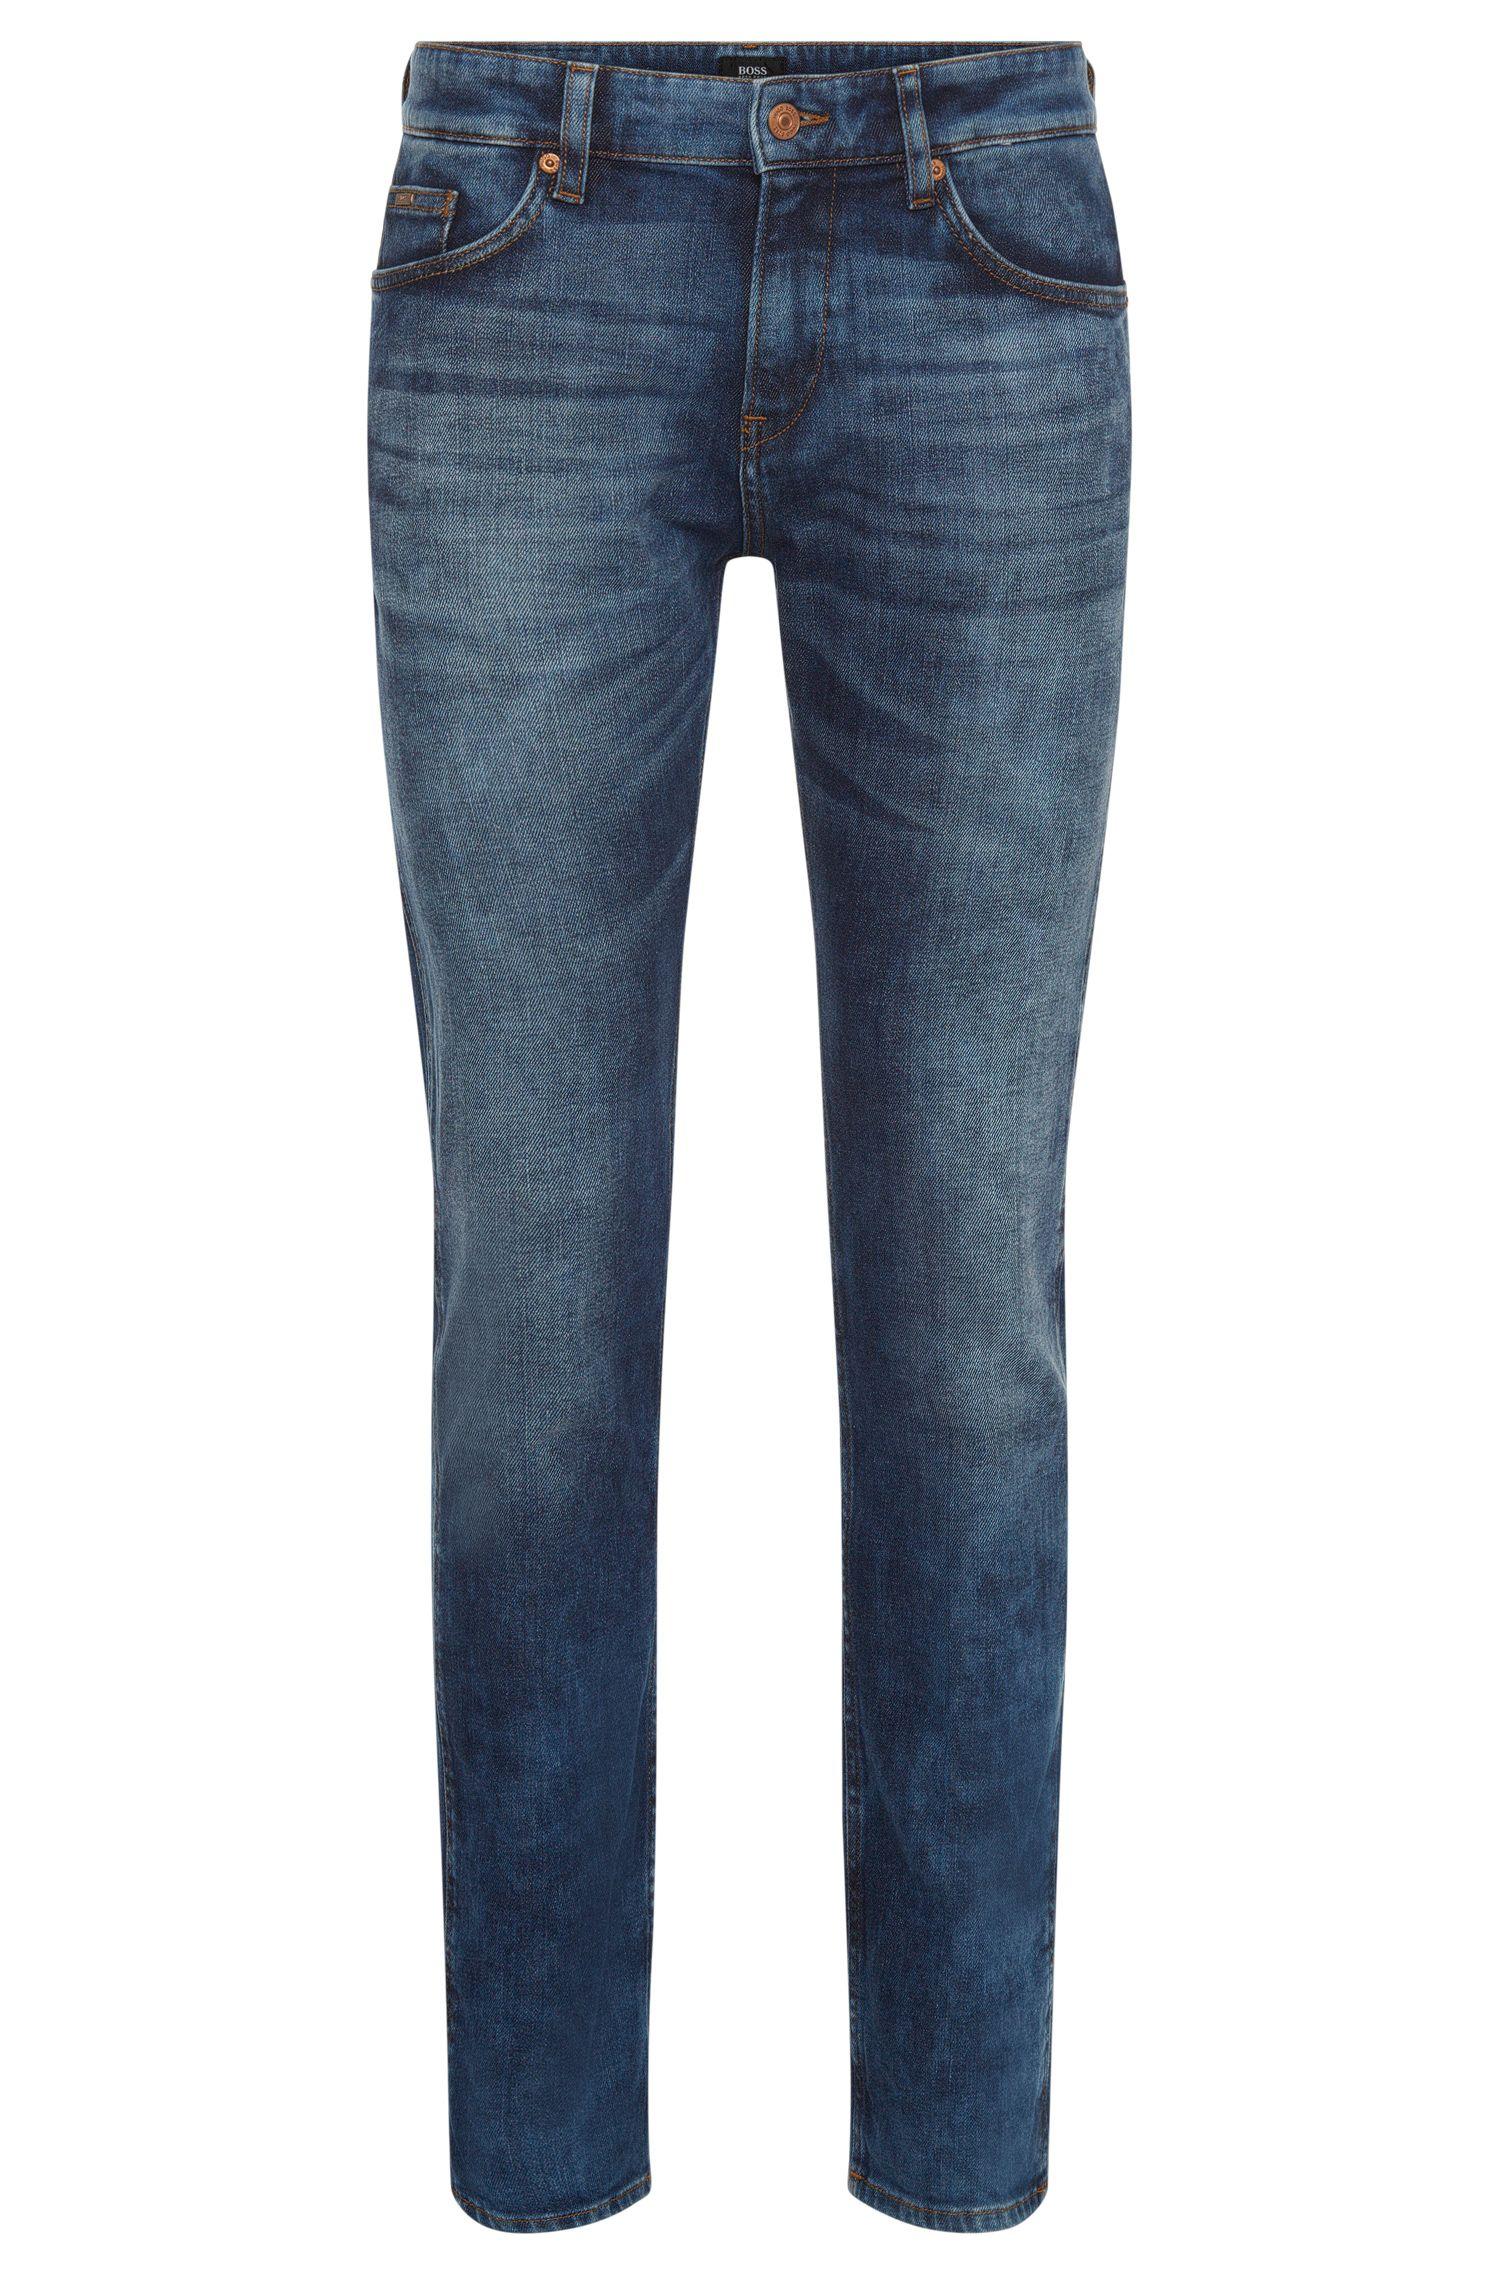 11 oz Stretch Cotton Jeans, Slim Fit | Delaware